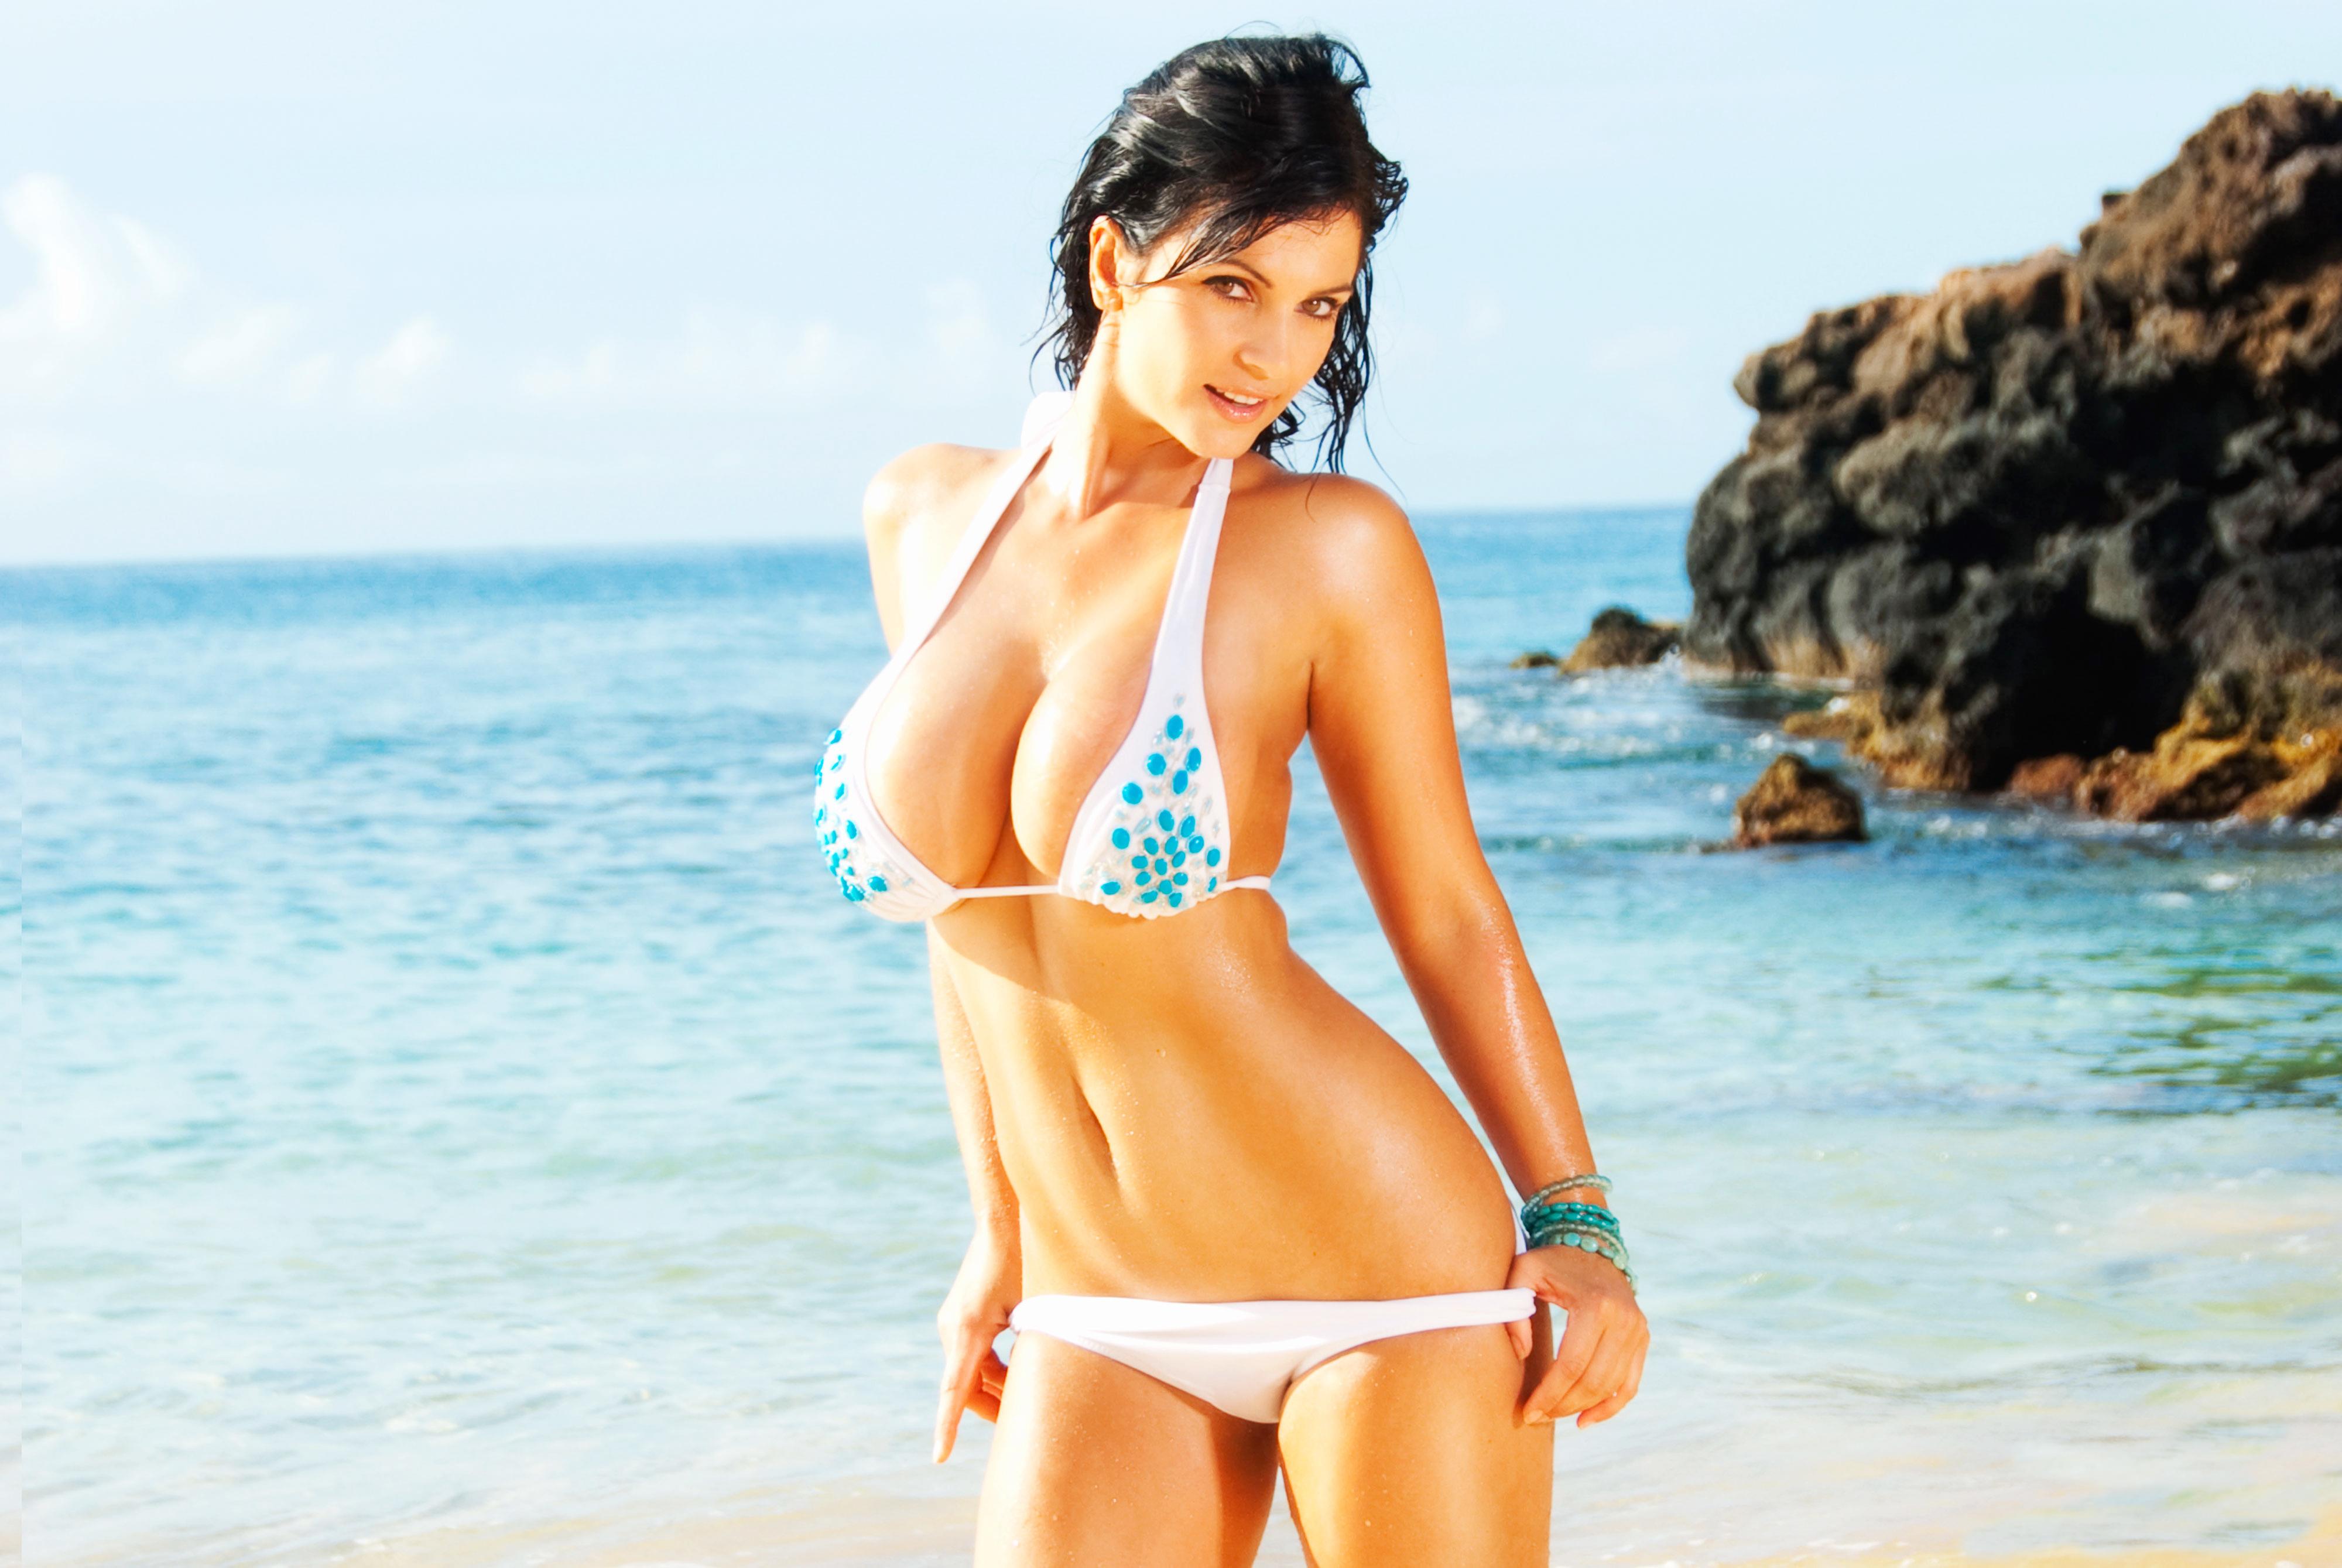 Beautiful Indian Girl Hd Wallpapers 1080p Denise Milani Sweetbeauty S Girls